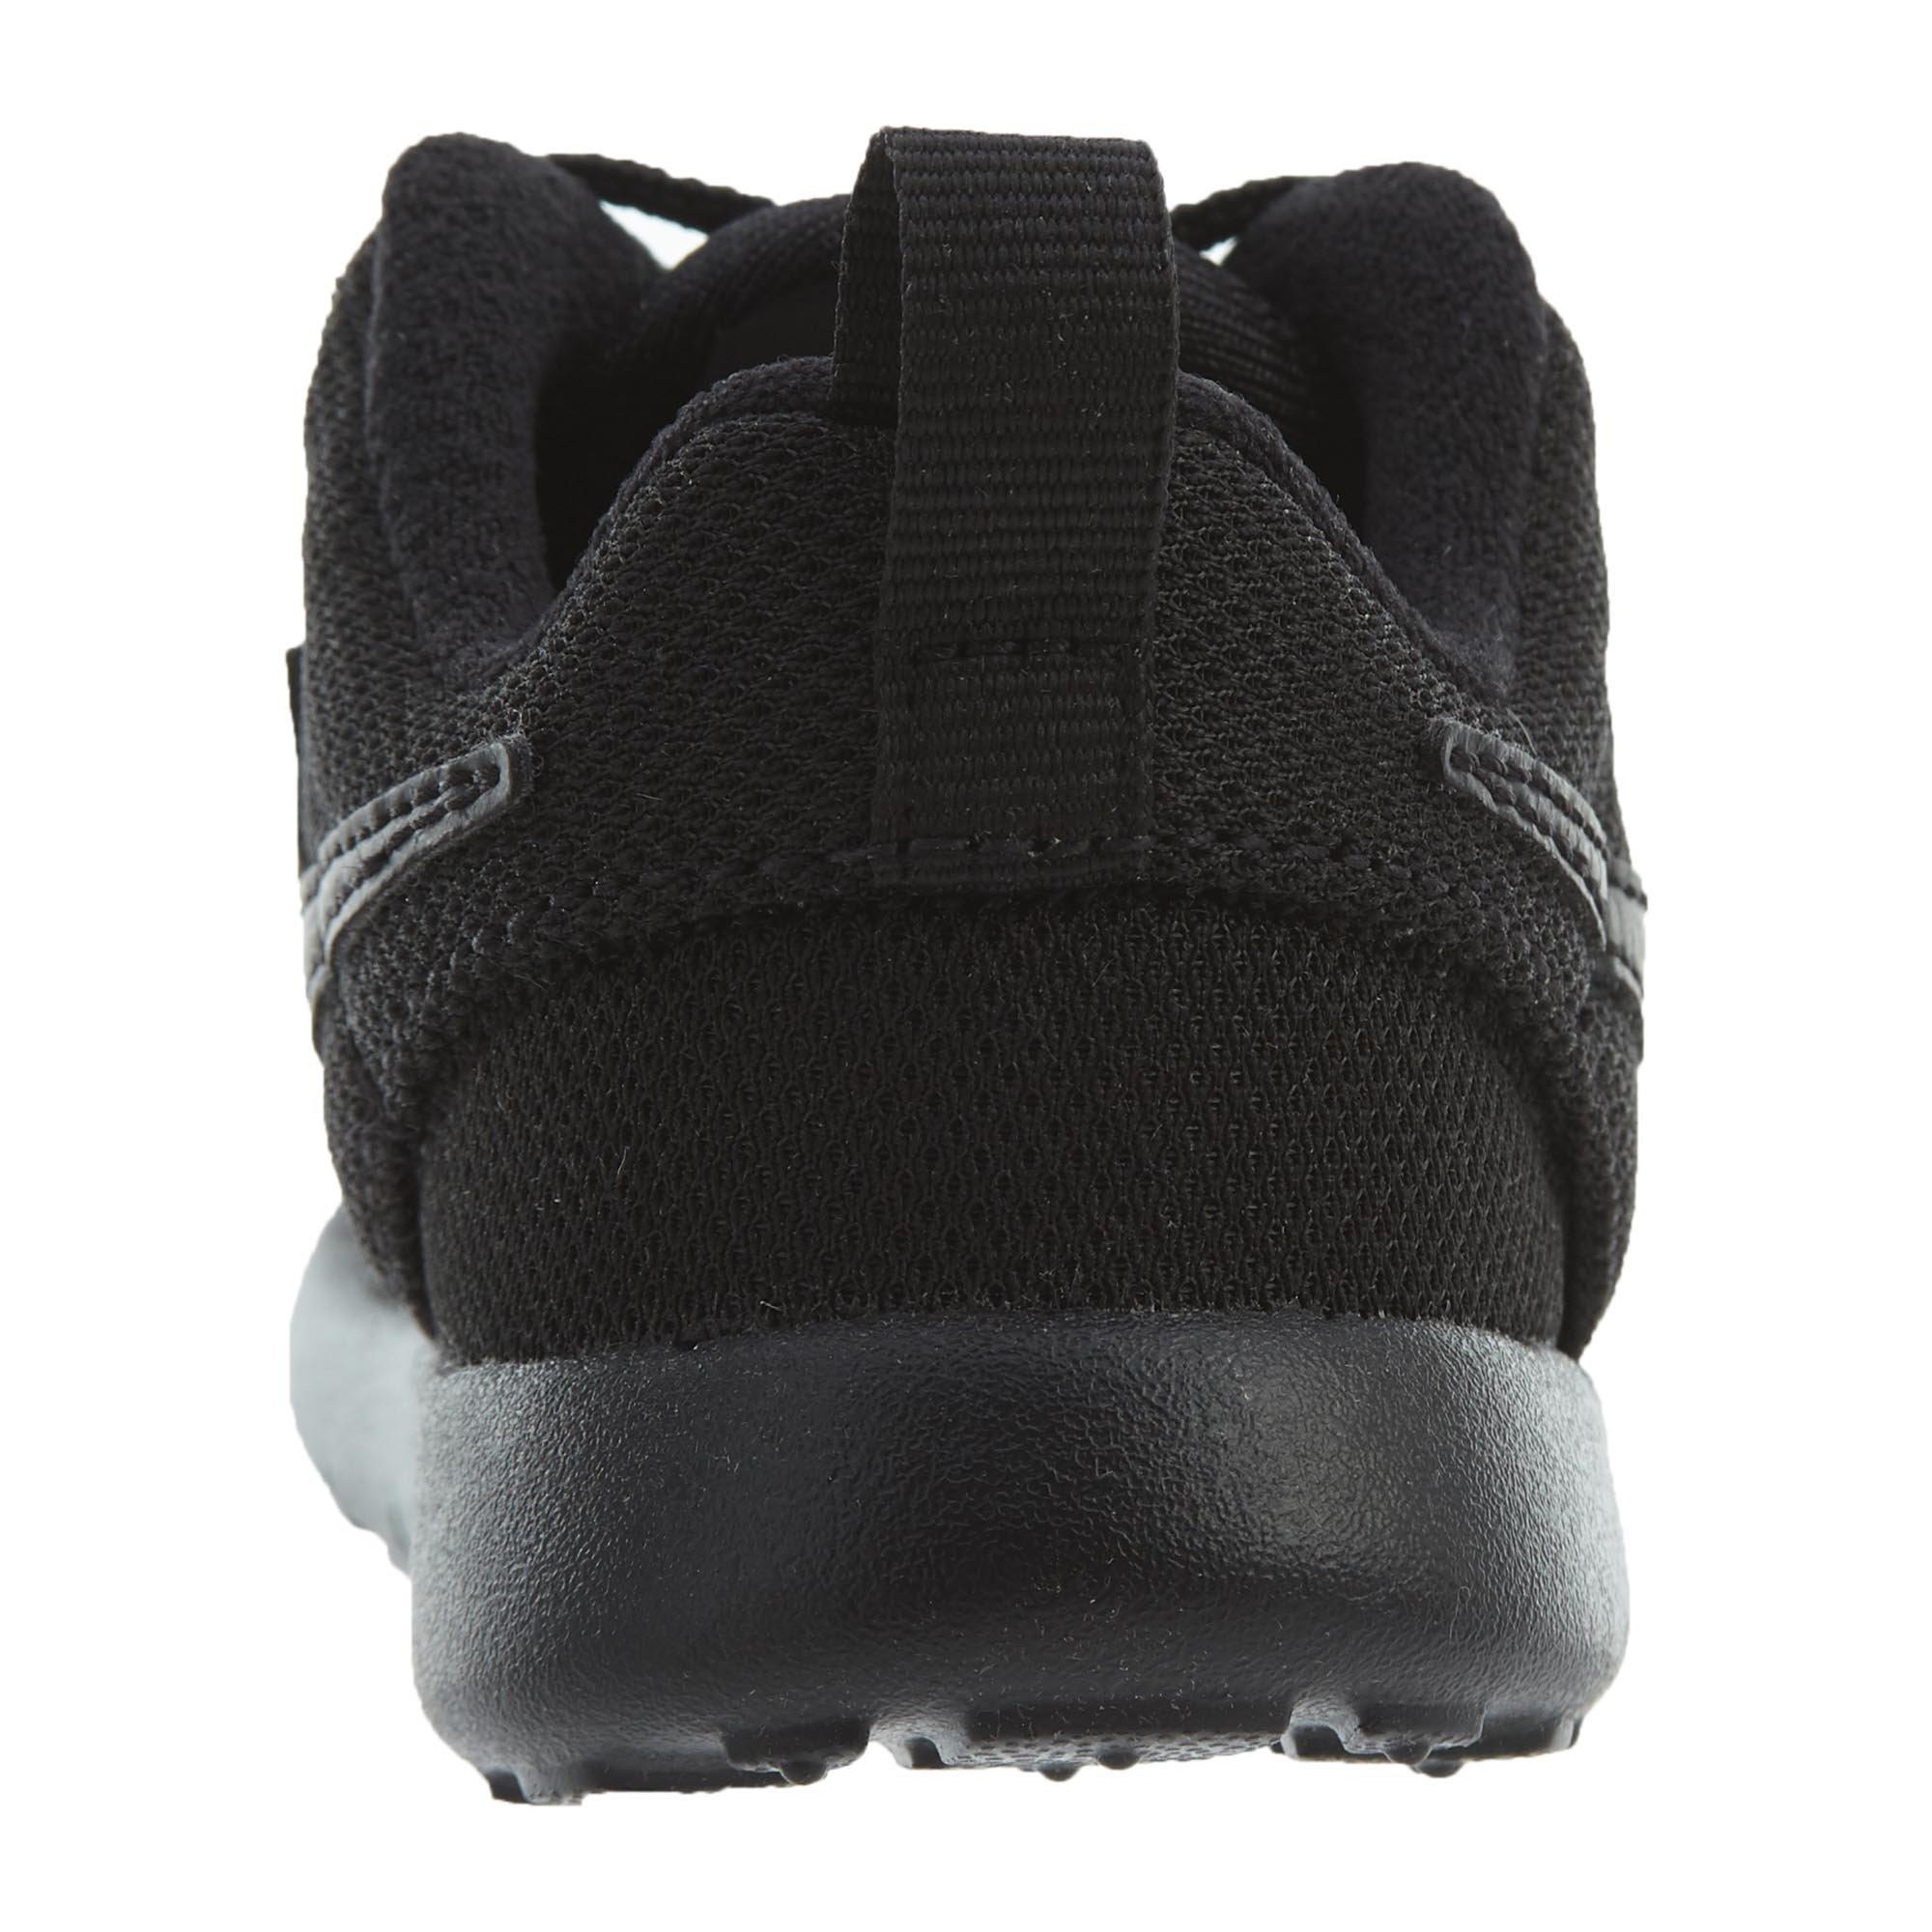 Nike Toddlers' Roshe One (TDV) Black Fabric Running Shoe 6 by Nike (Image #3)